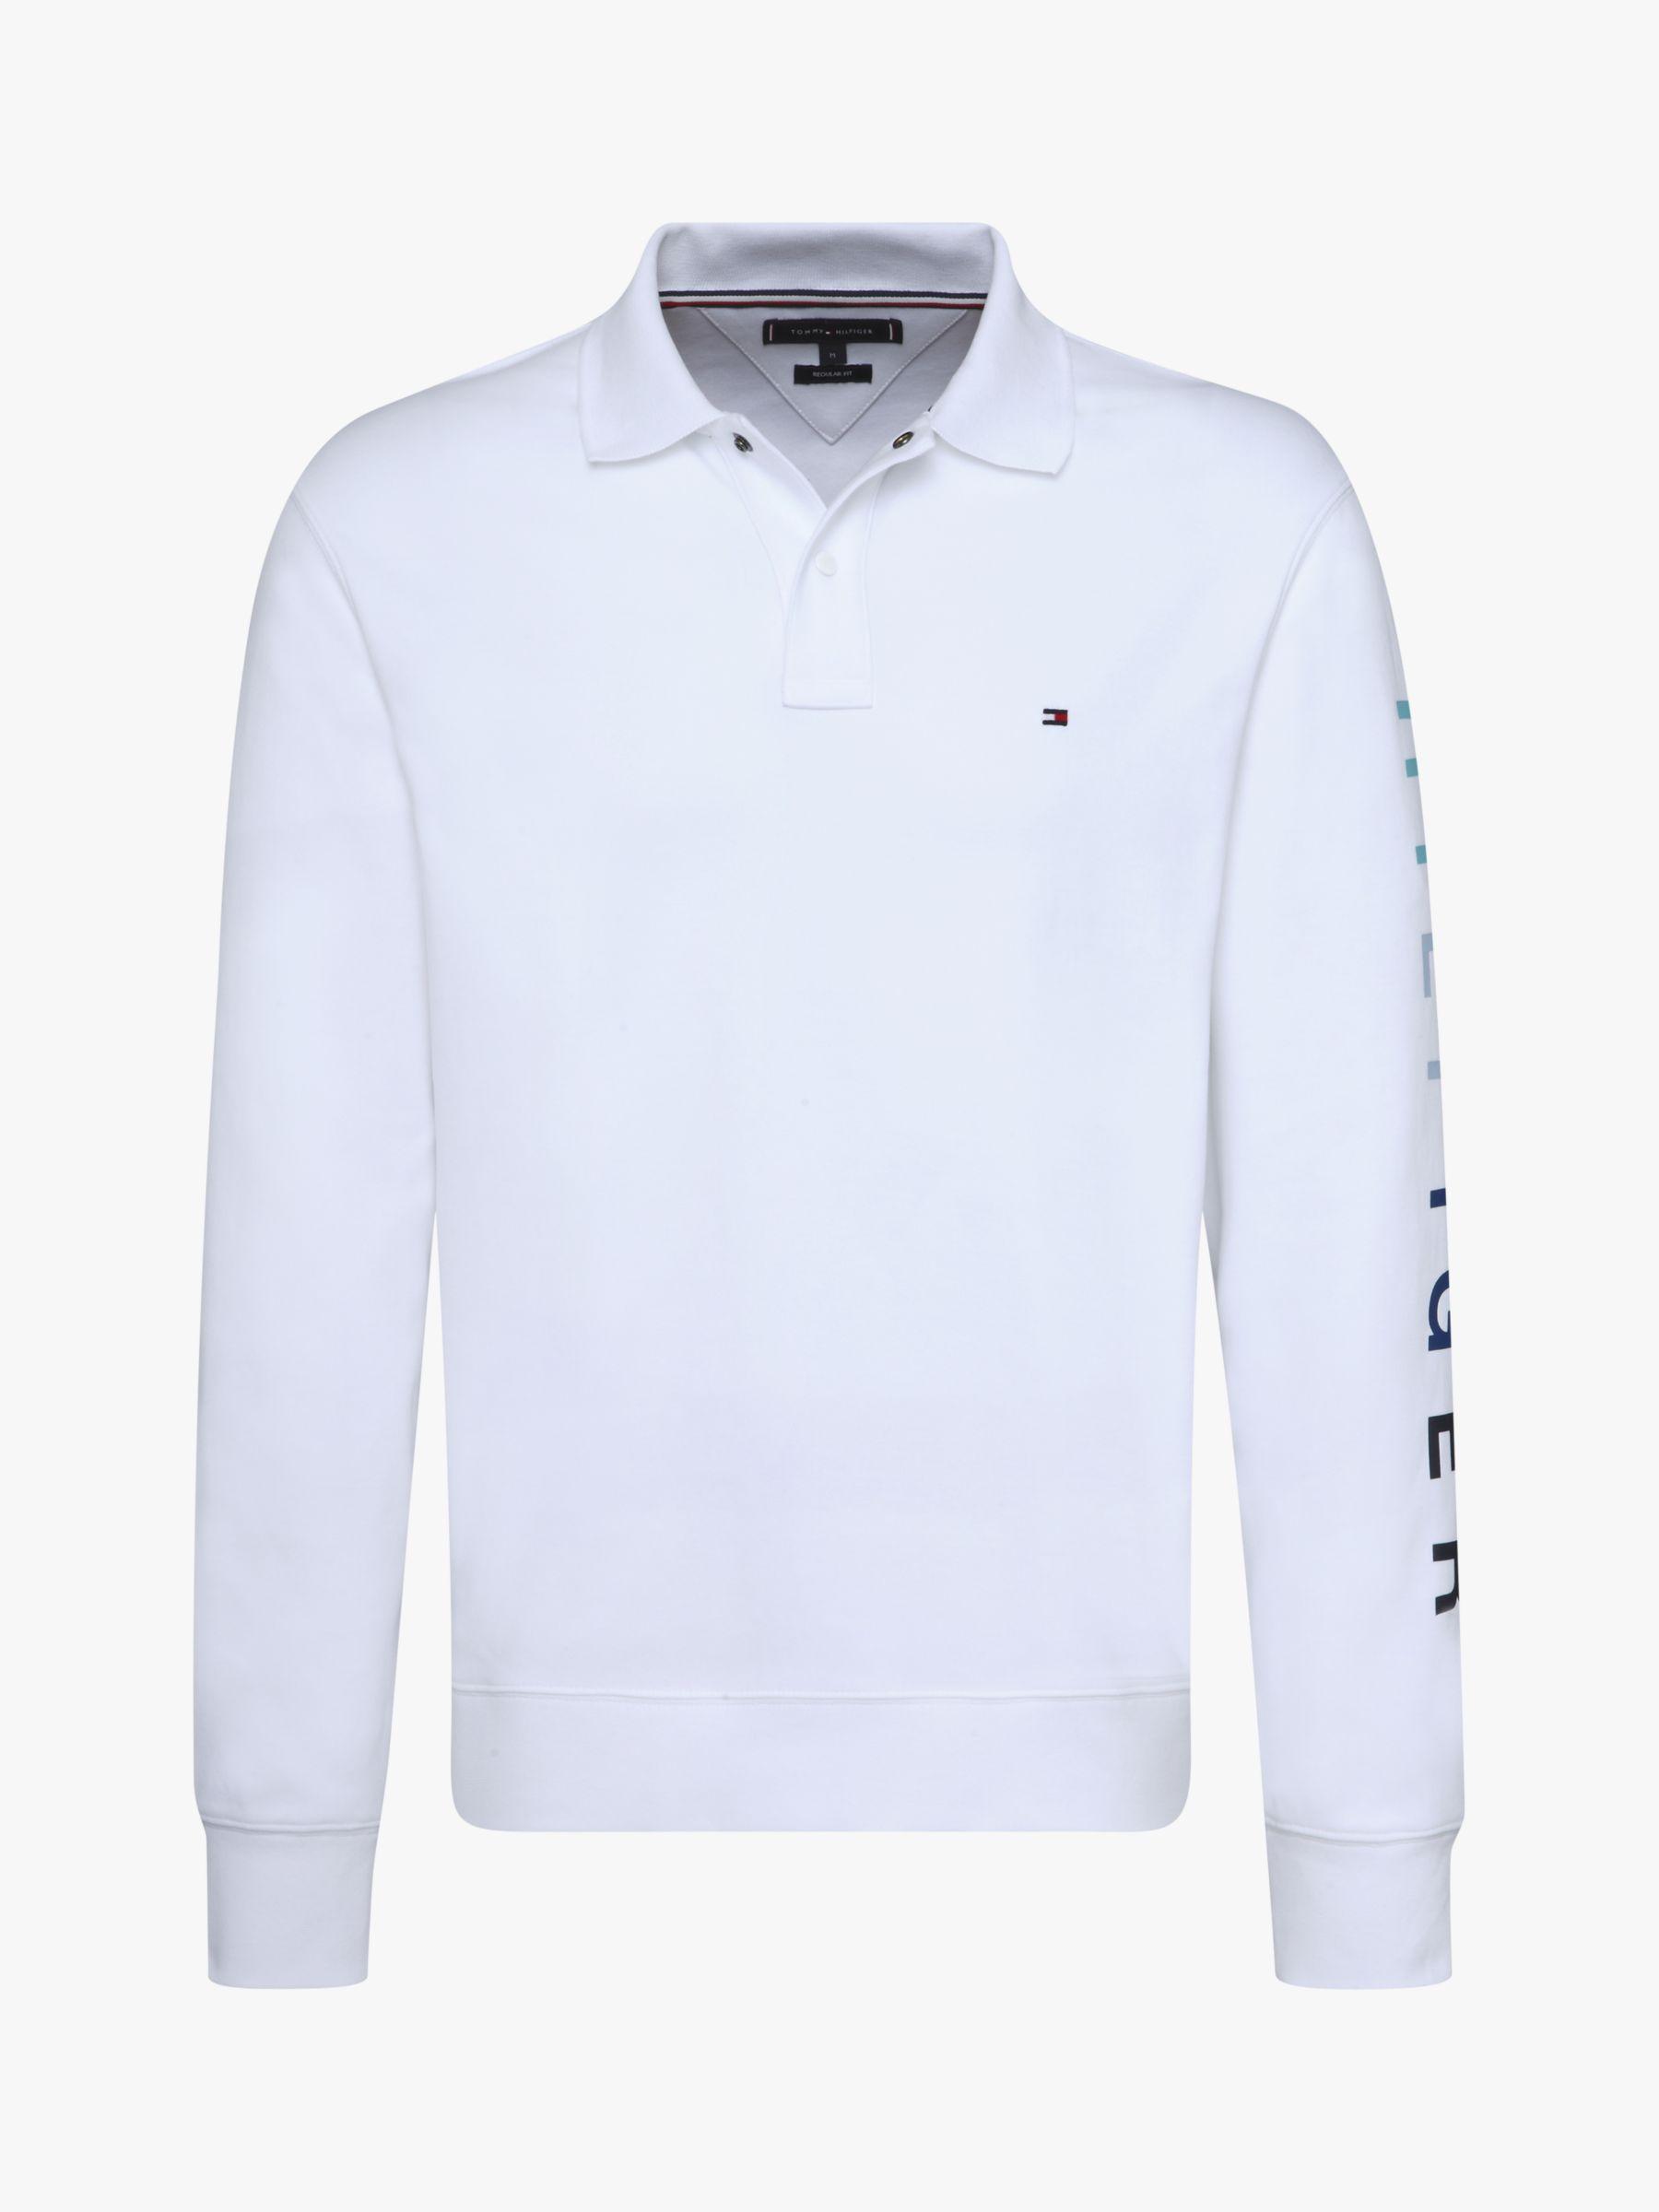 Tommy Hilfiger Boys Sleeve Text Polo S//S Shirt